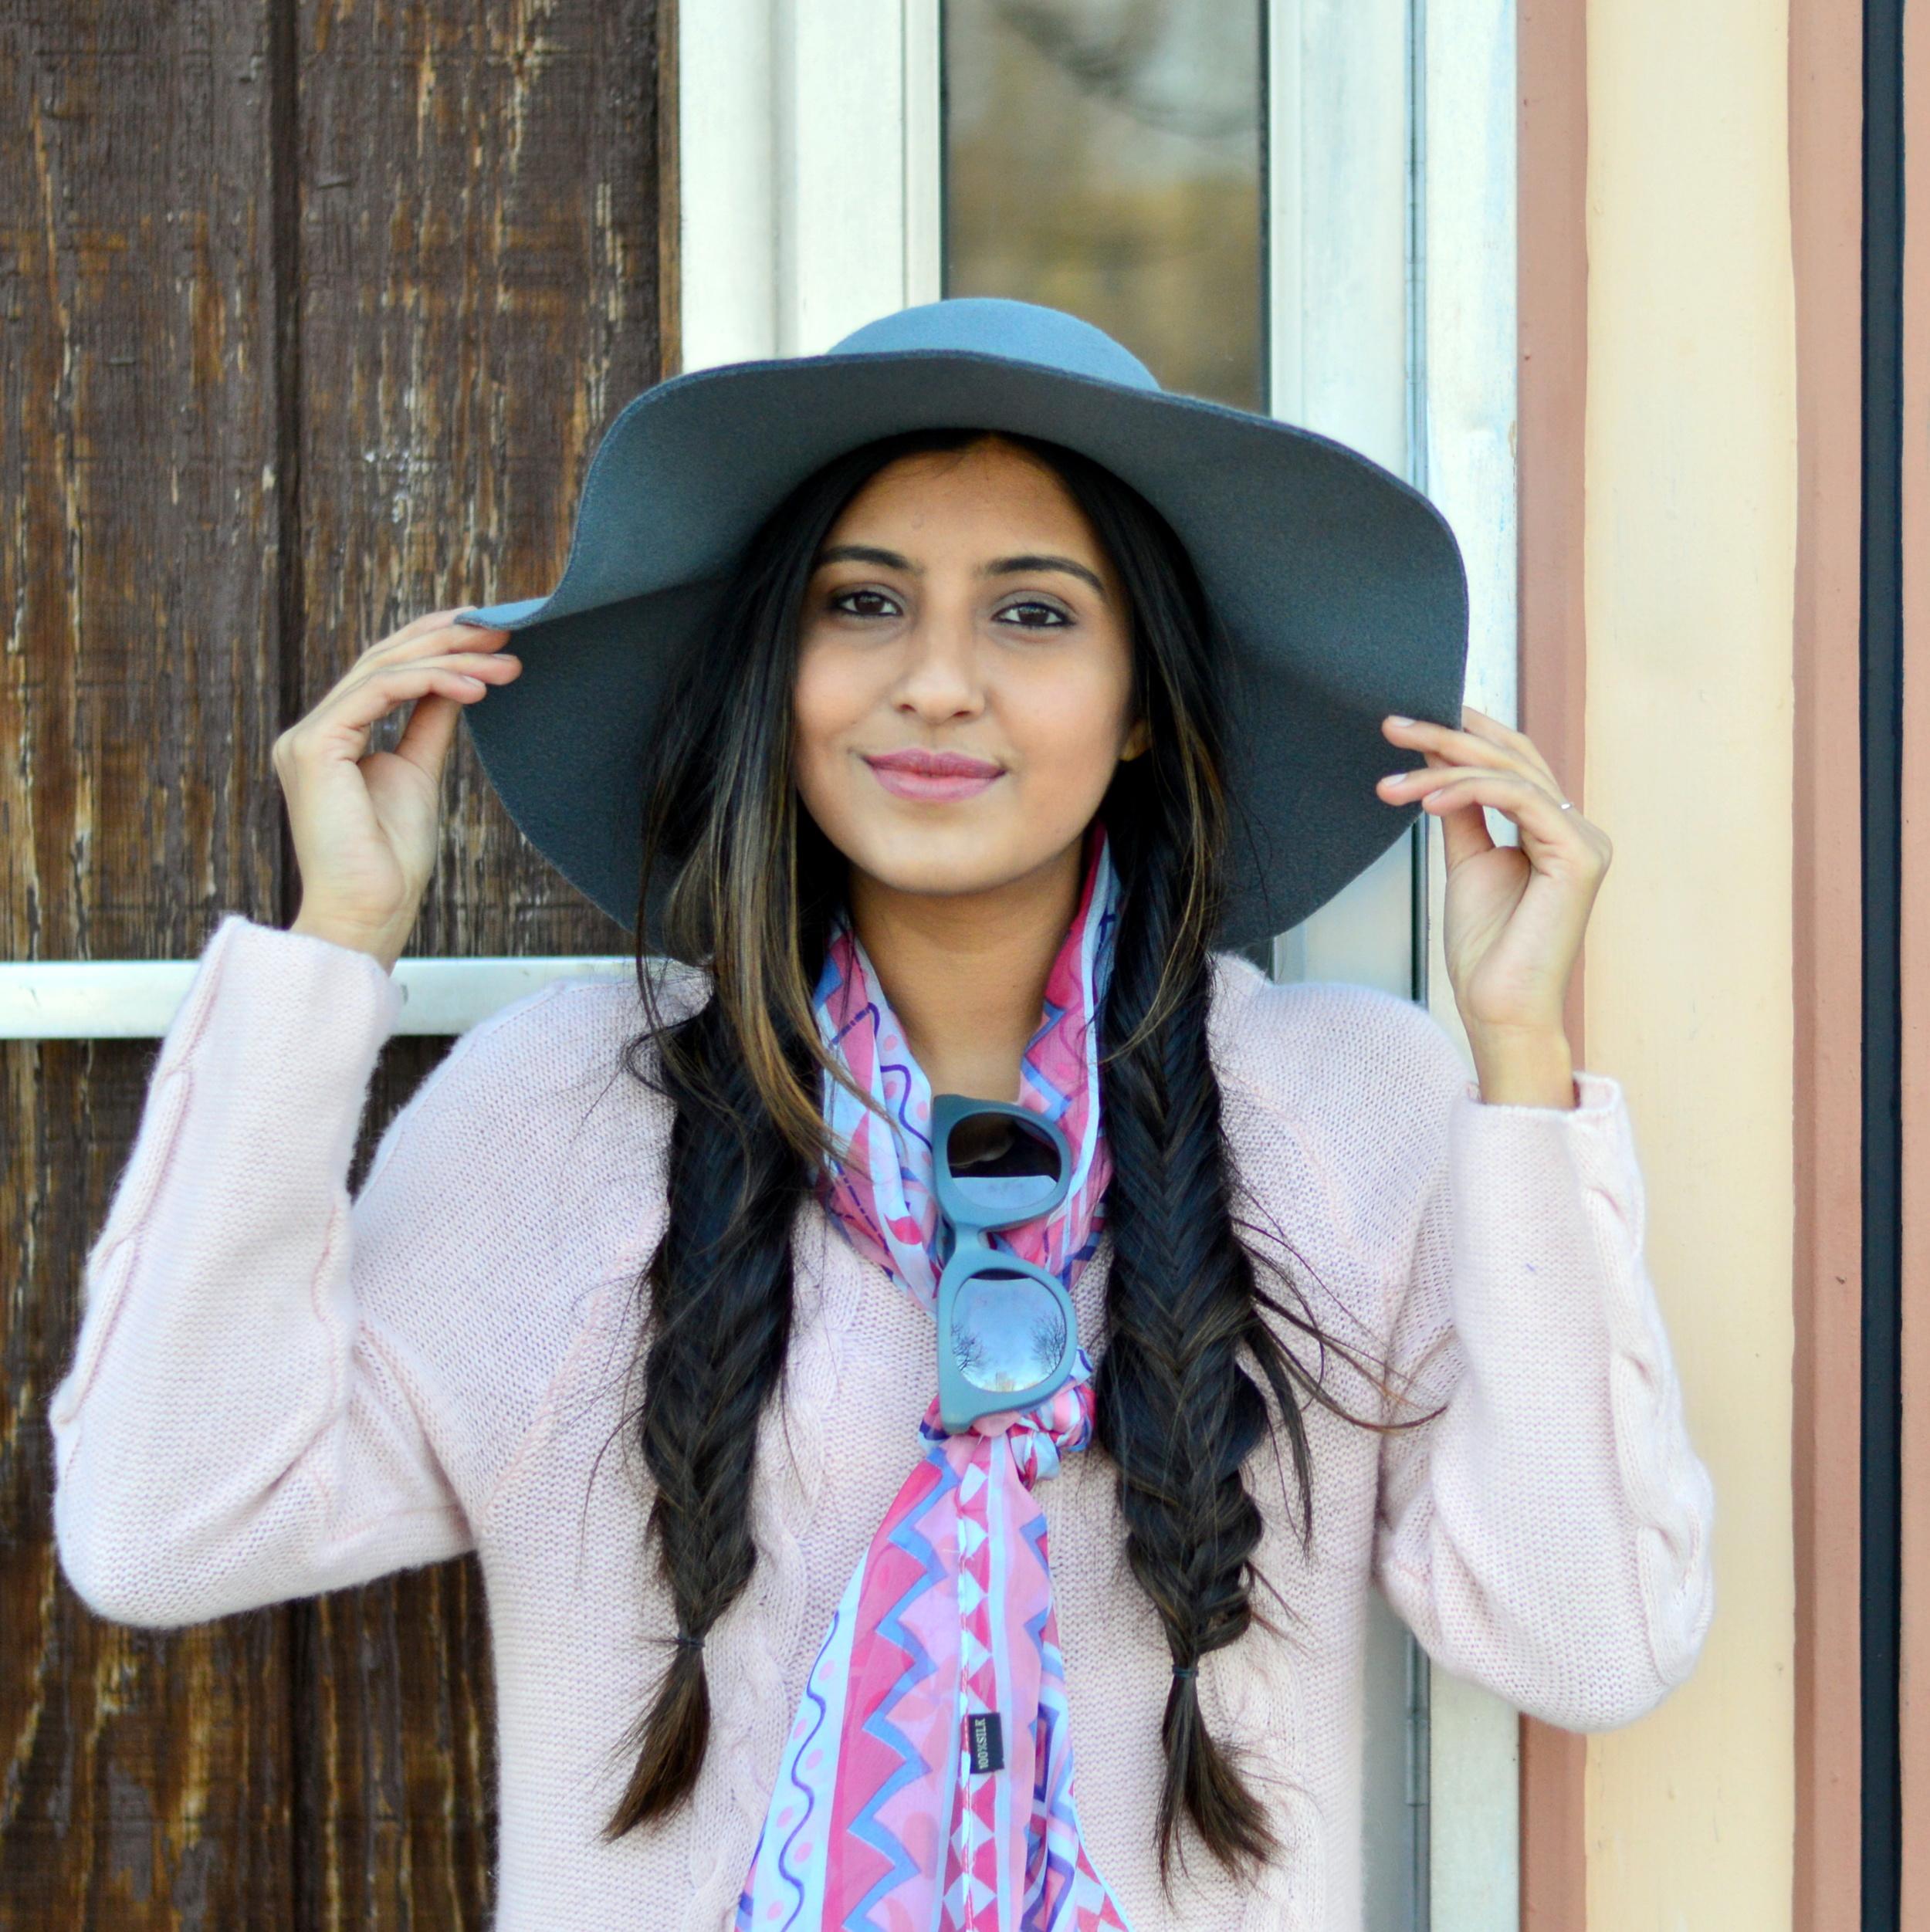 rose-quartz-transition-spring-fashion-blogger-outfit